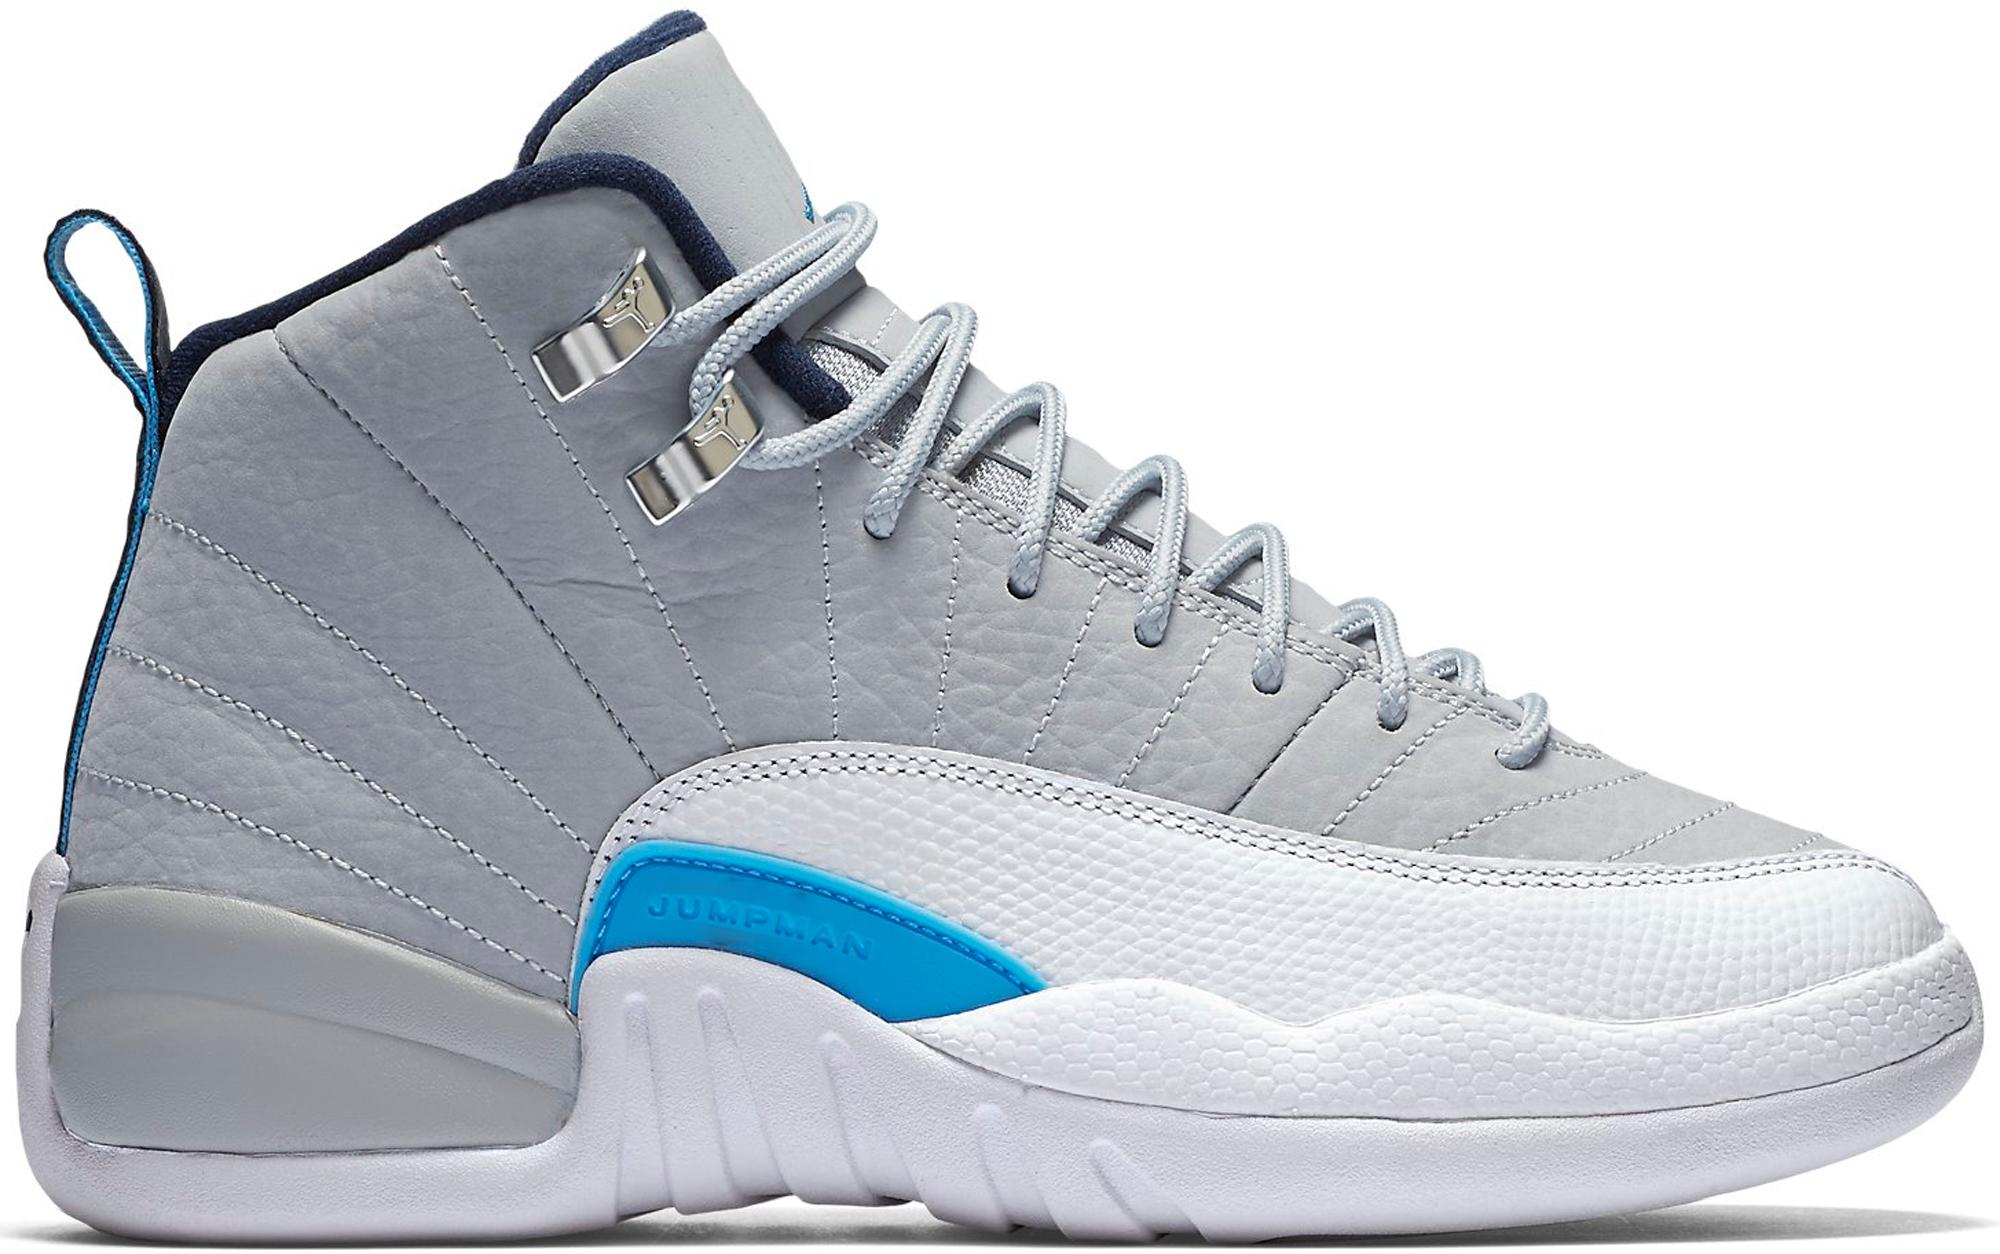 Jordan 12 Retro Grey University Blue (GS)